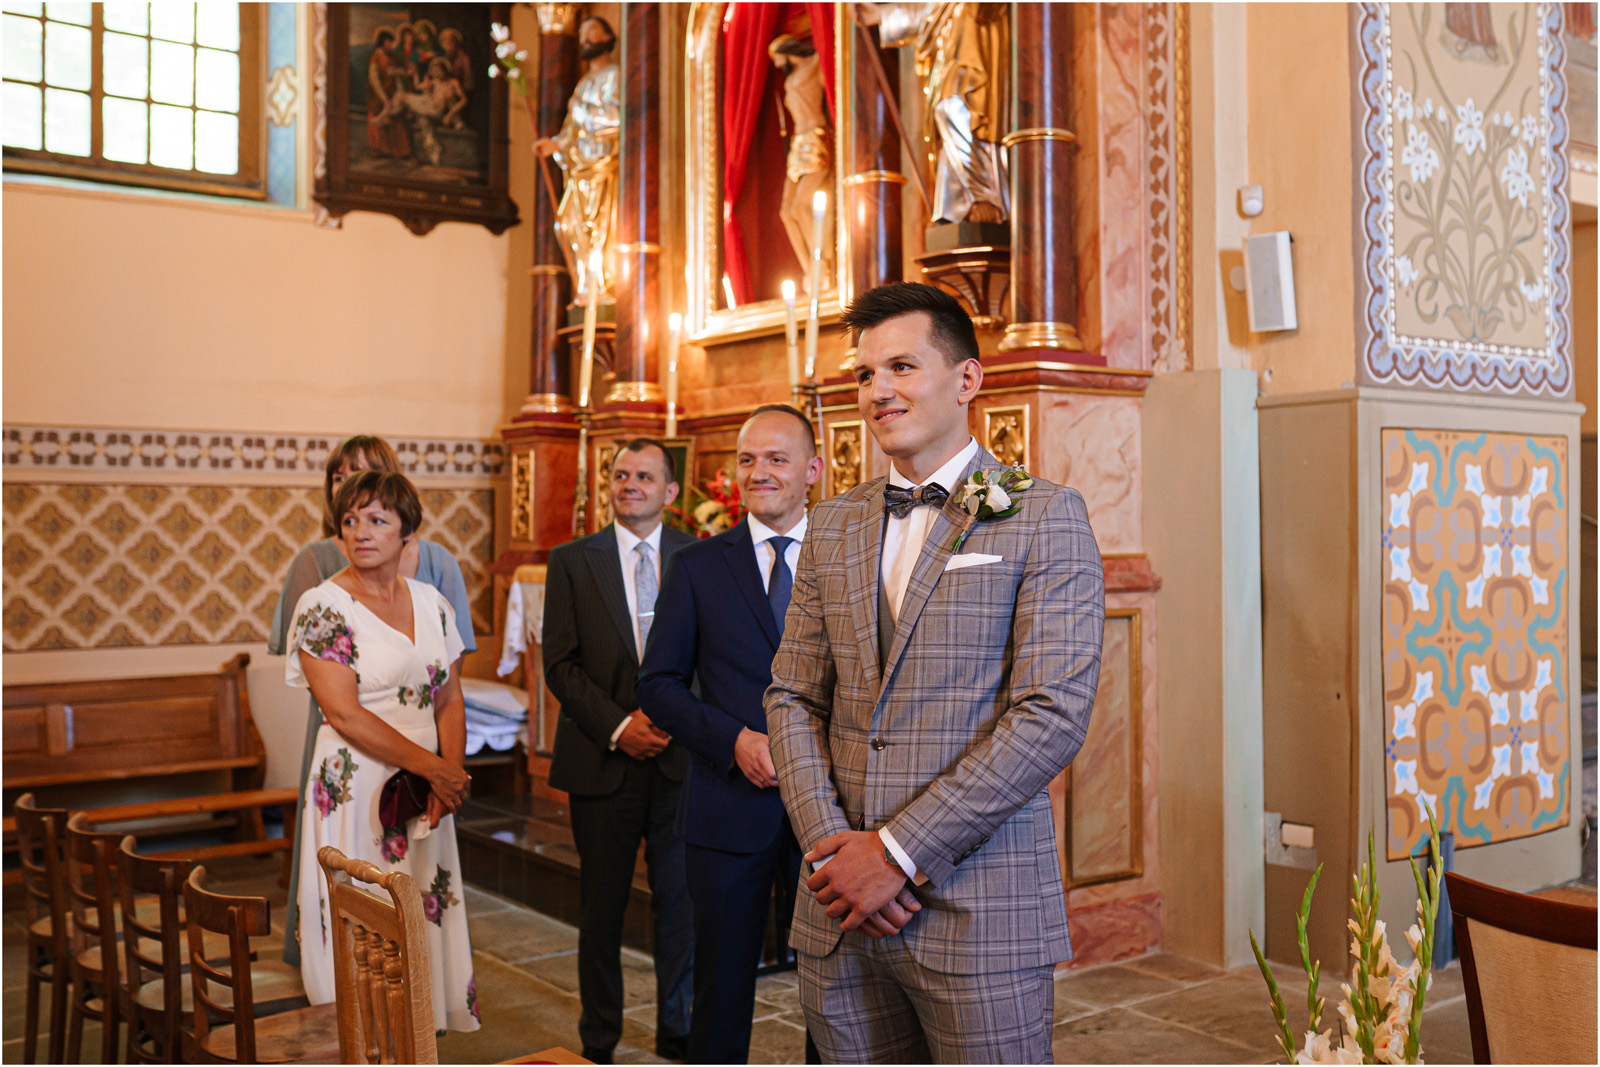 Ania & Mateusz | boho wesele w Stodole pod Kasztanami 37